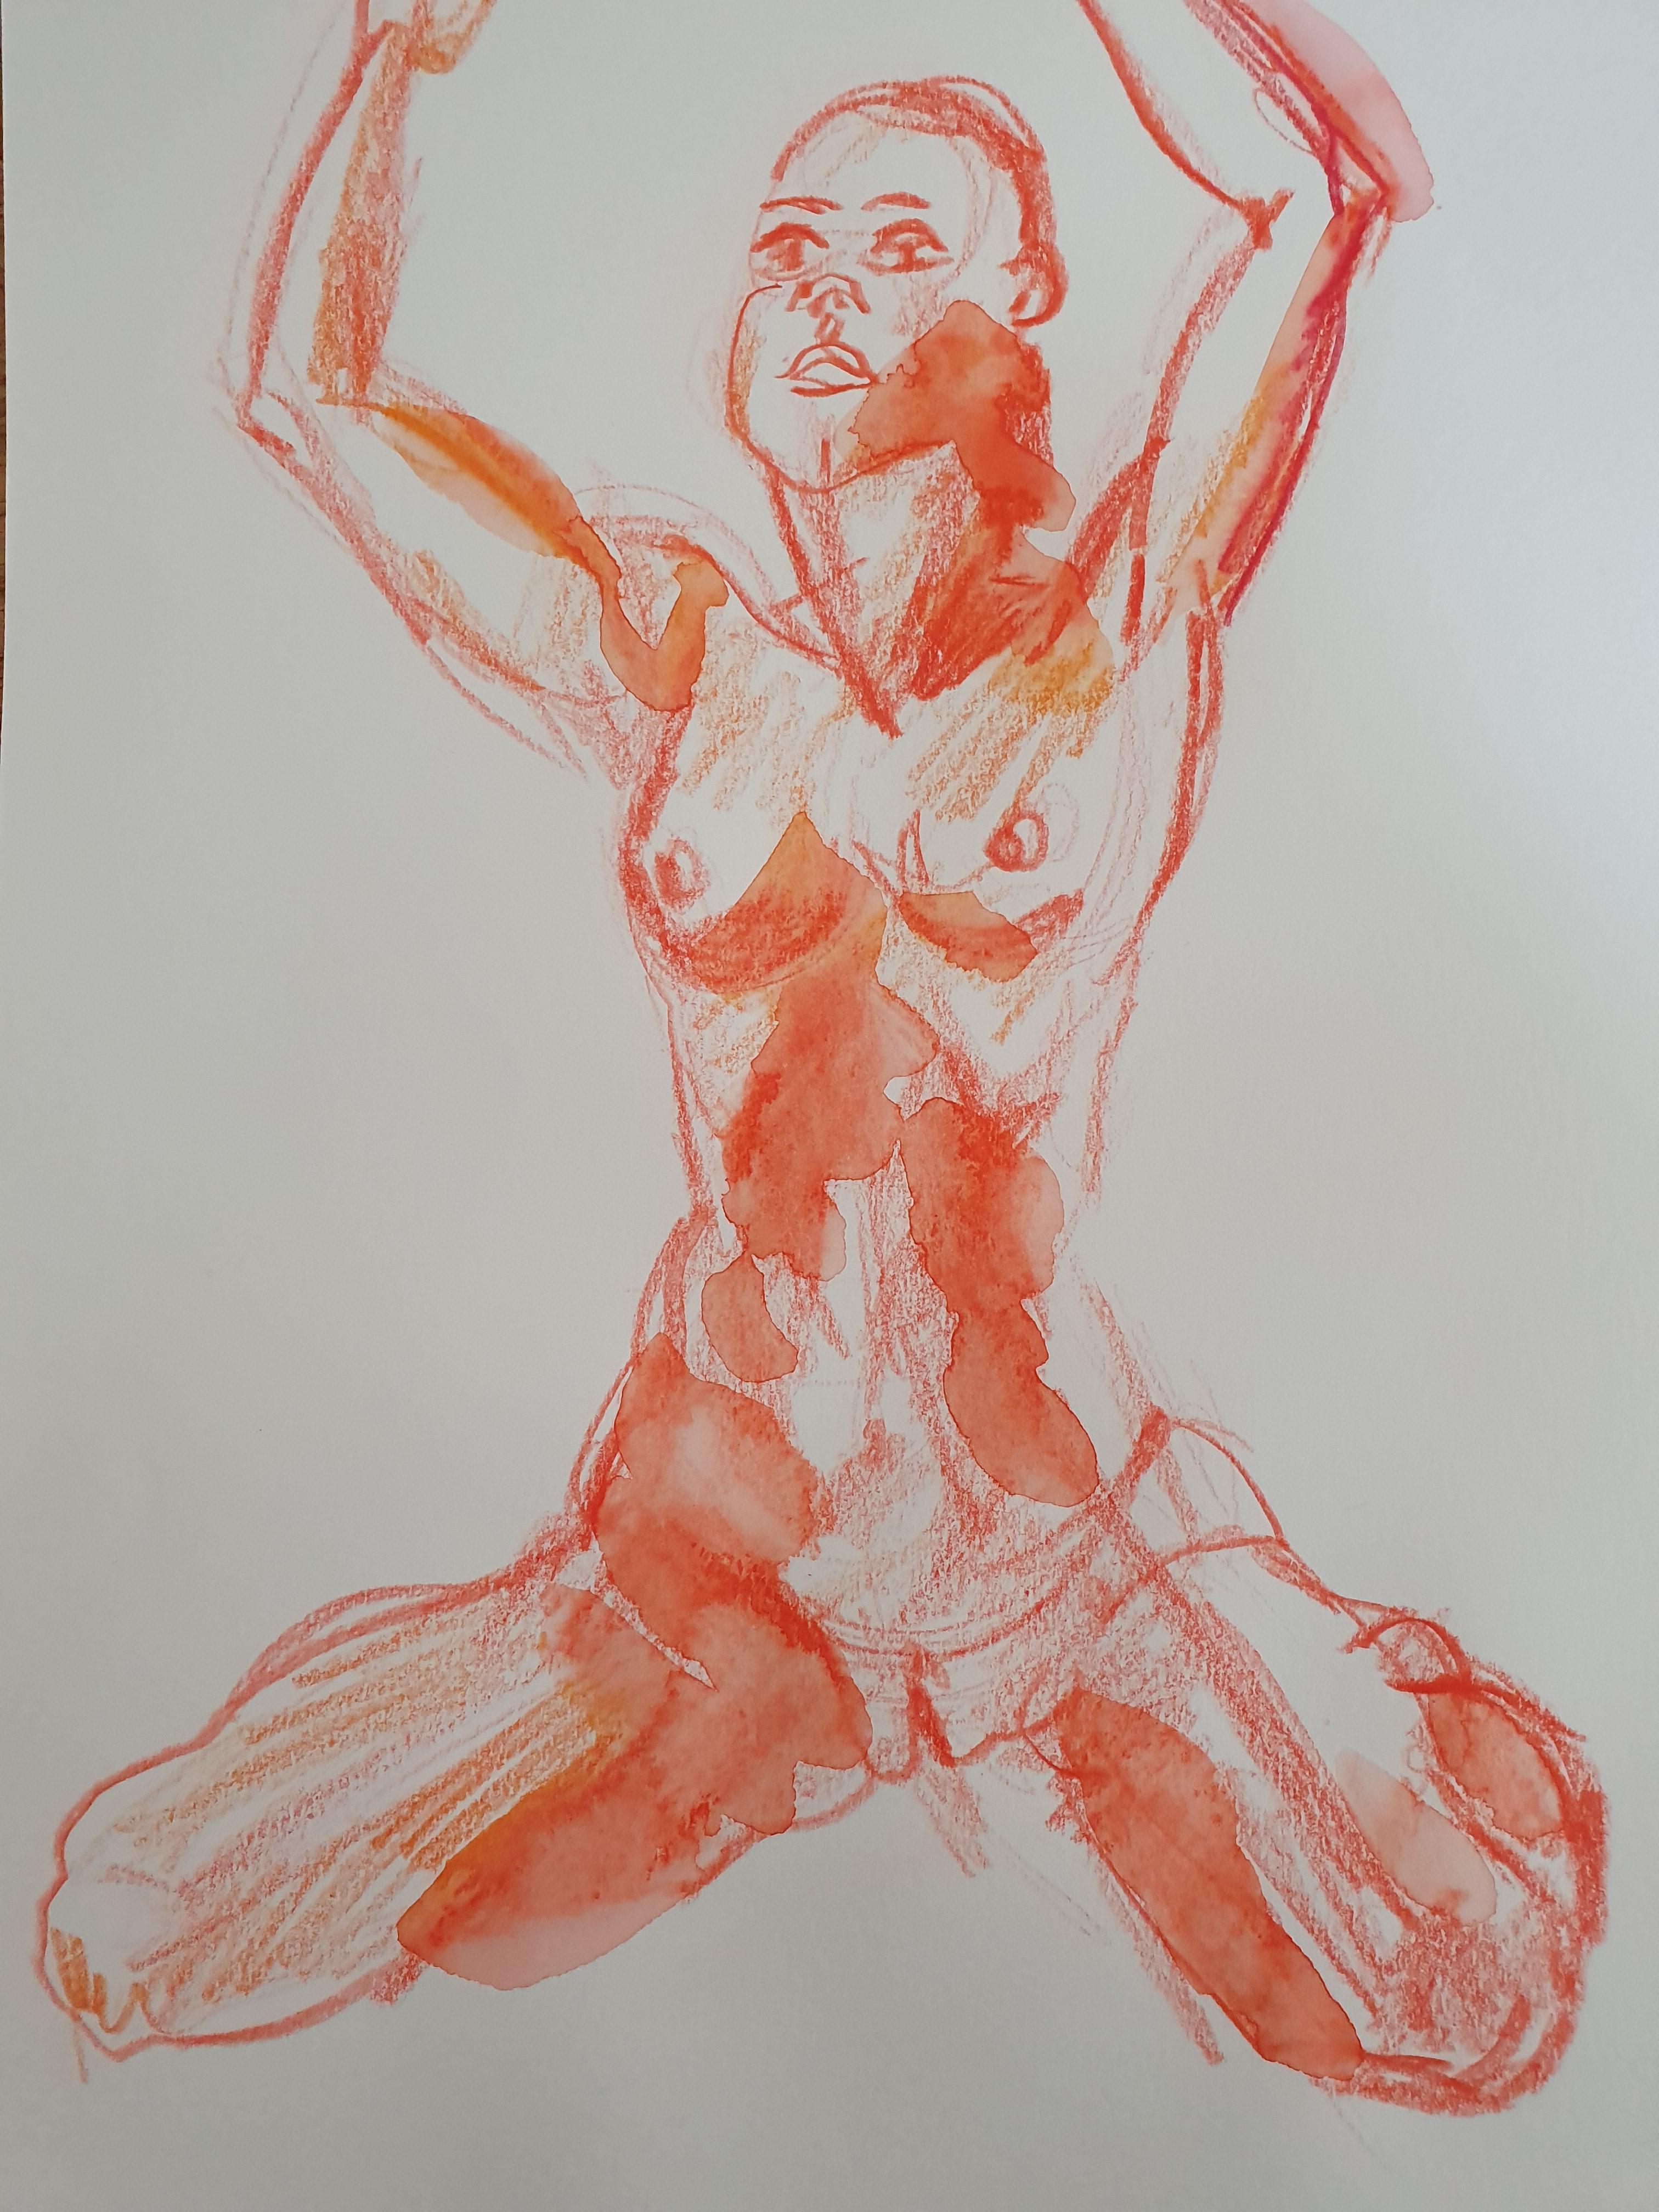 dessin crayons aquarelleisable orange   cours de dessin